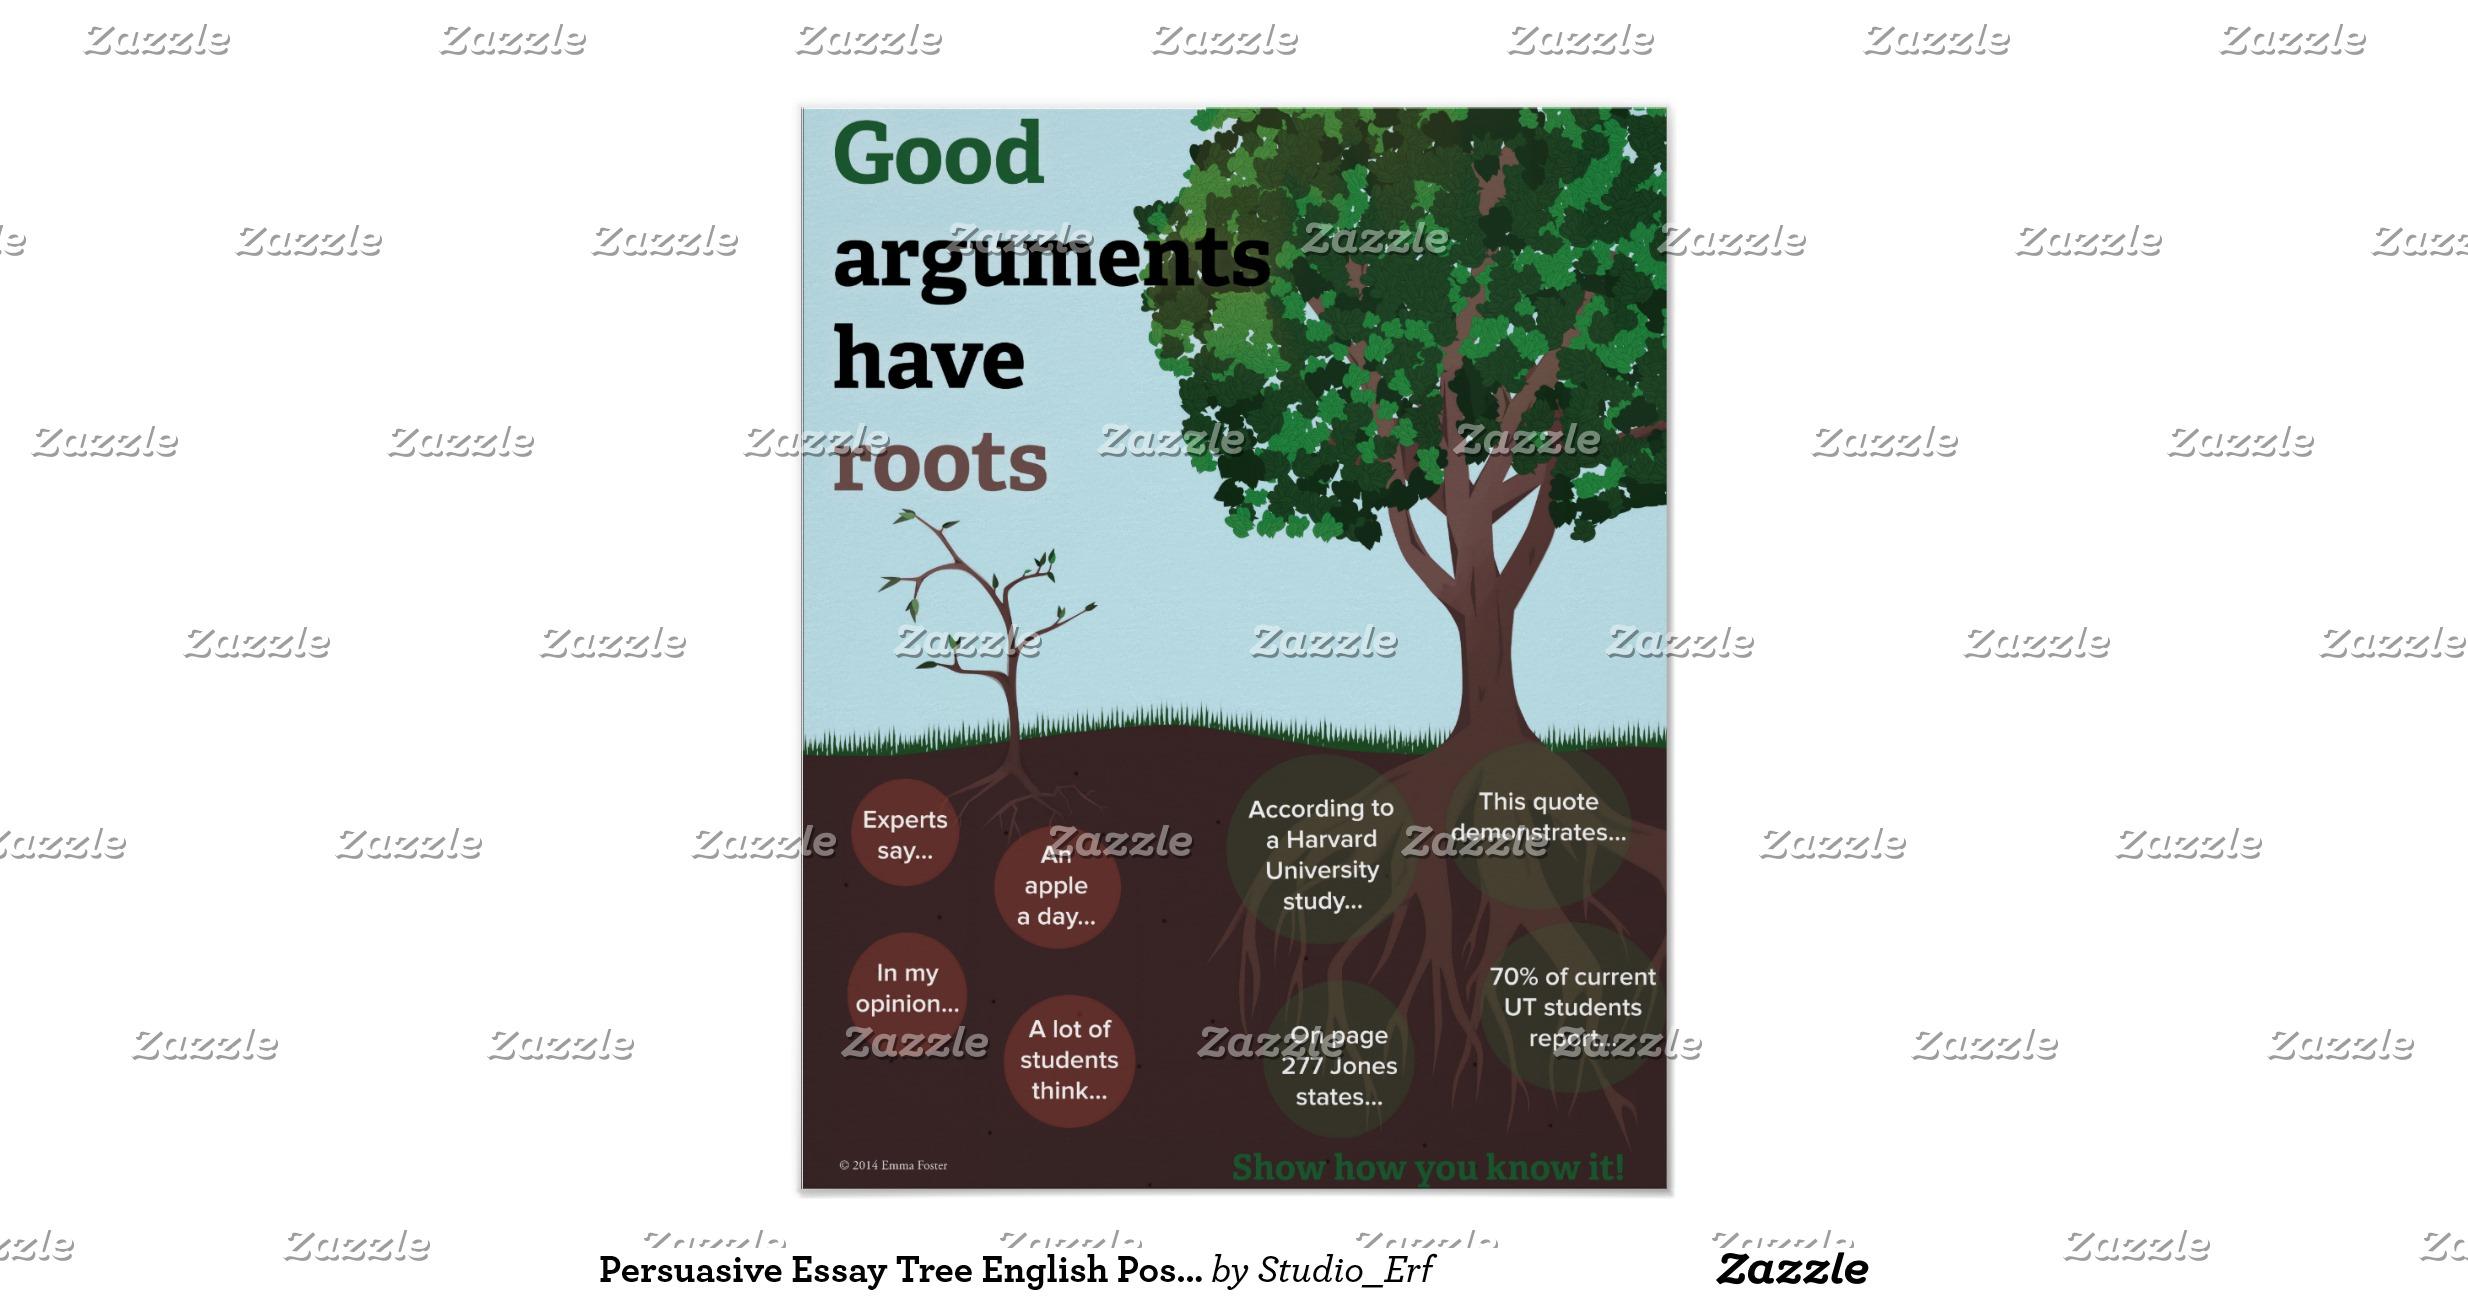 020 Tree Essay Persuasive English Poster R8be3ce2455f34b5d94cdccbff38c0c9f Qoe 8byvr 1200view Padding0 Unforgettable Neem In Sanskrit Kannada Hindi Full